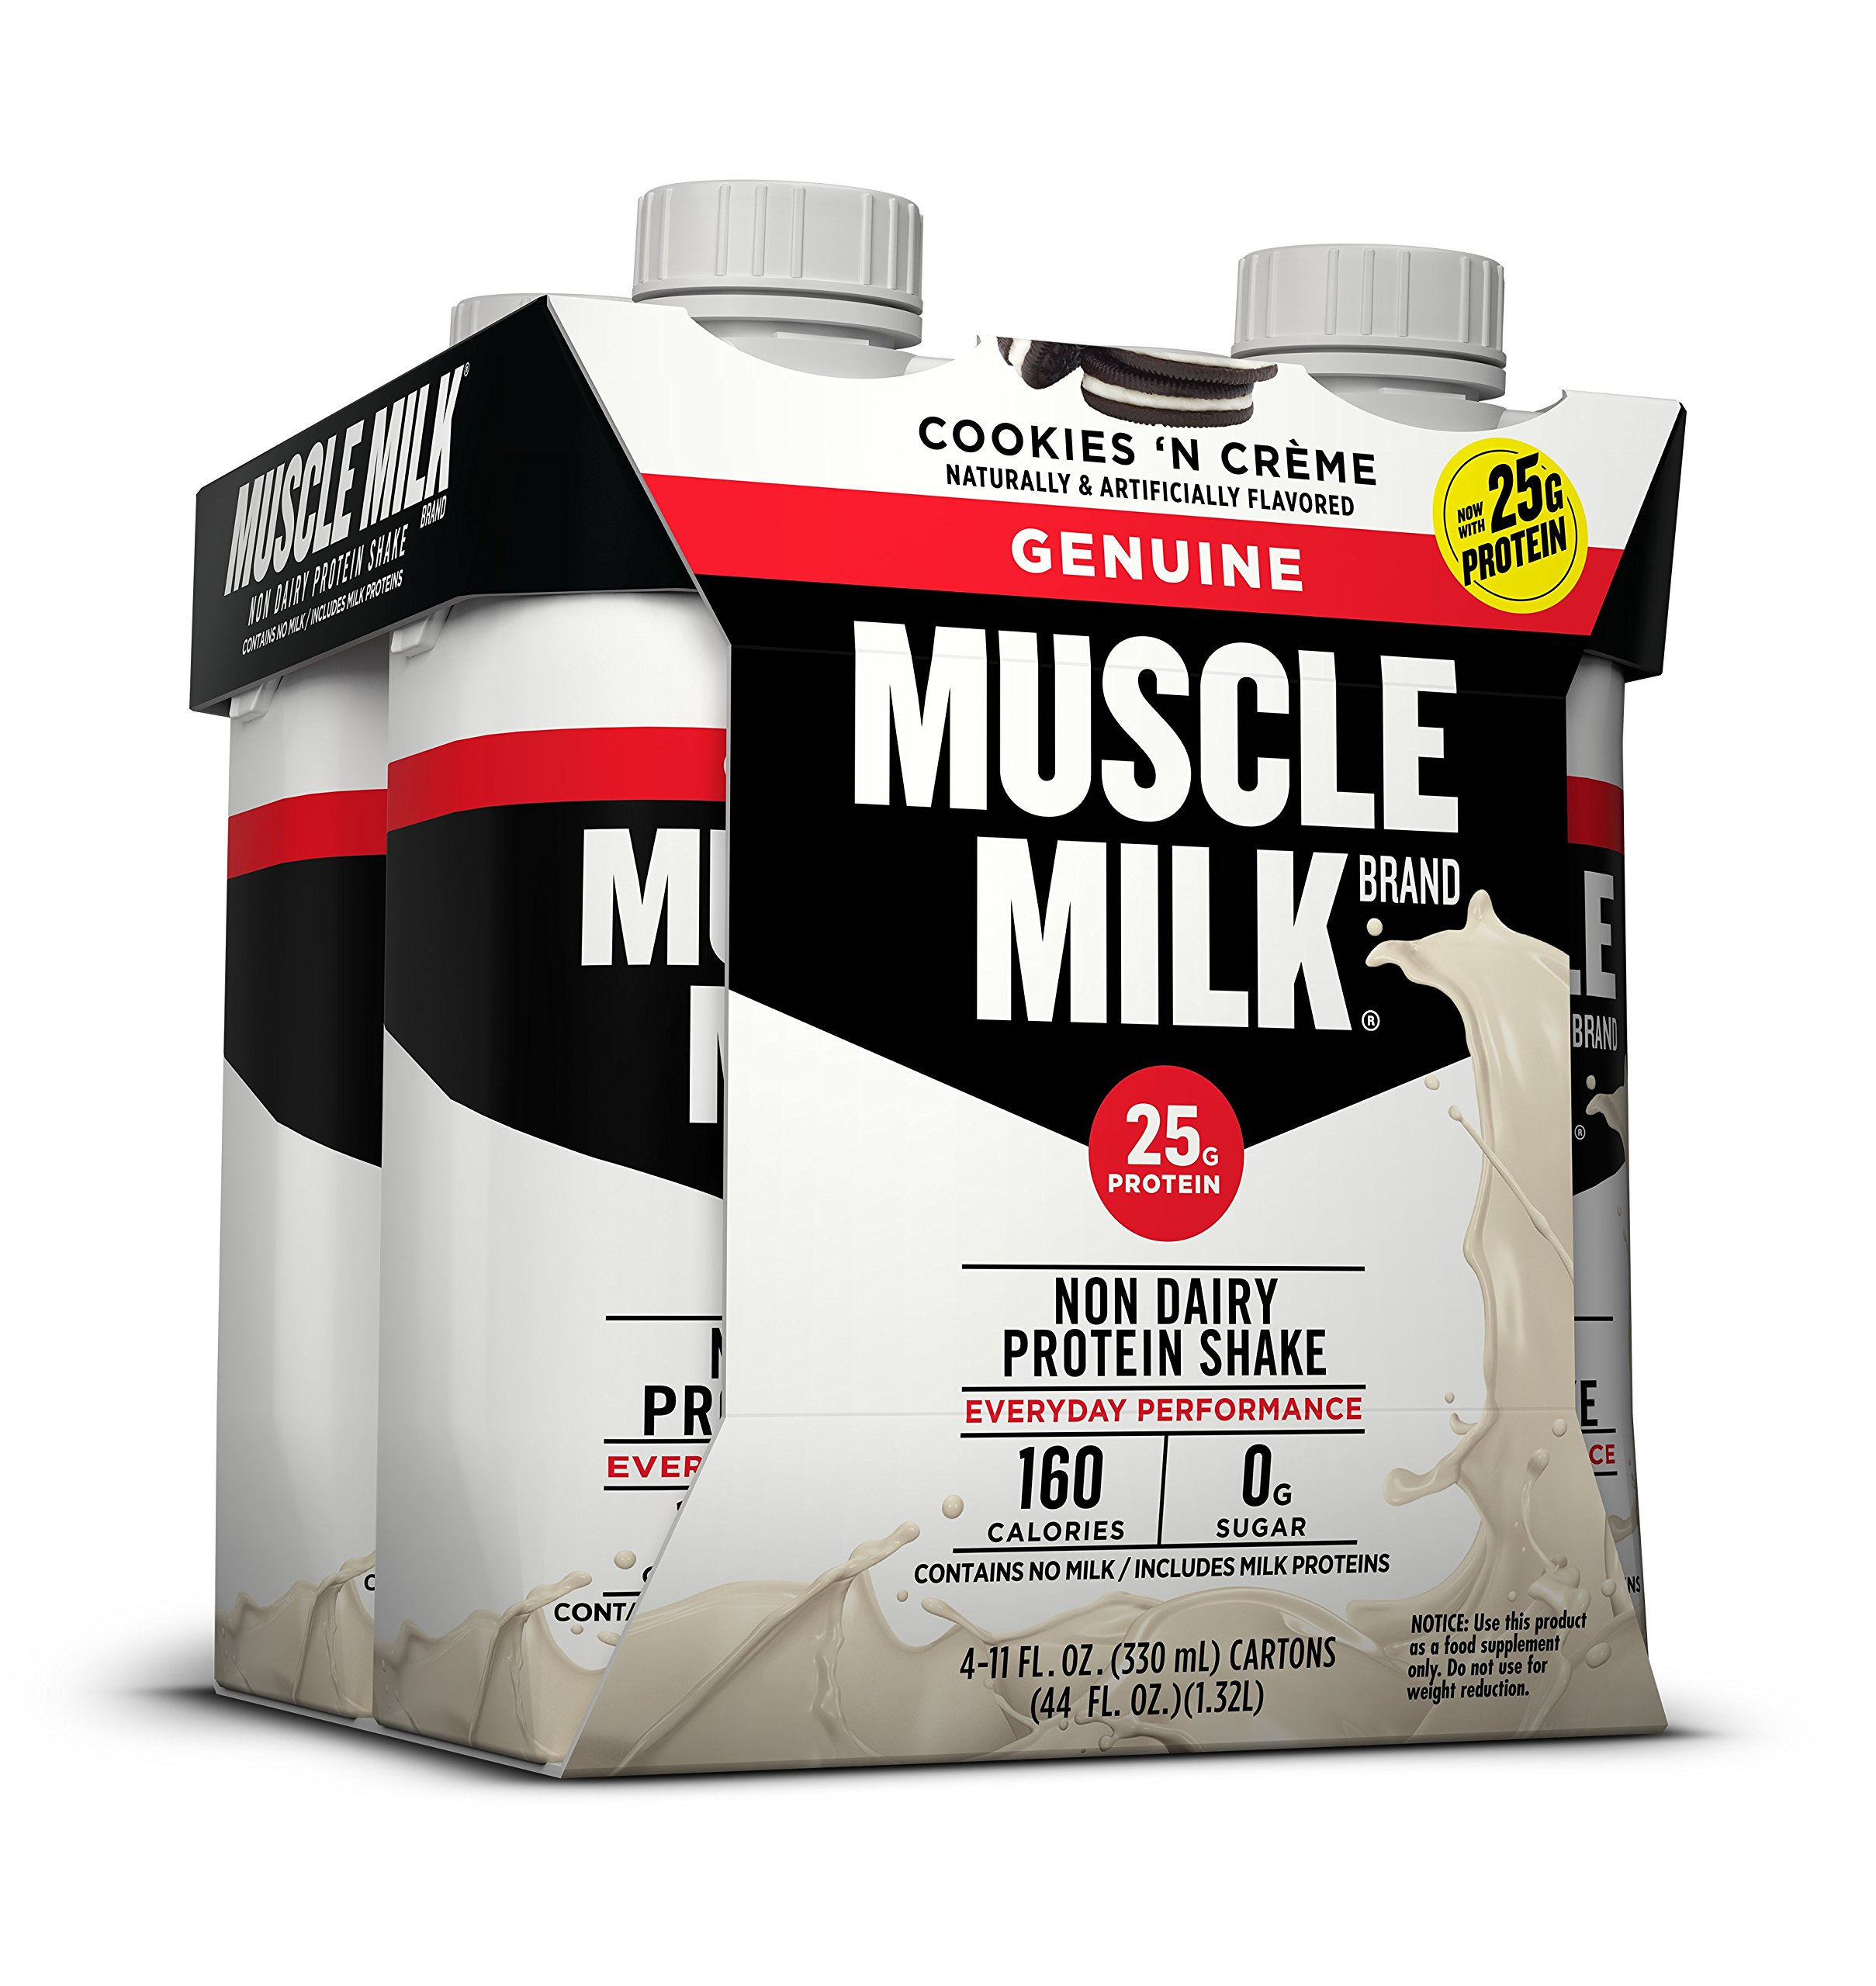 Muscle milk 4 pack